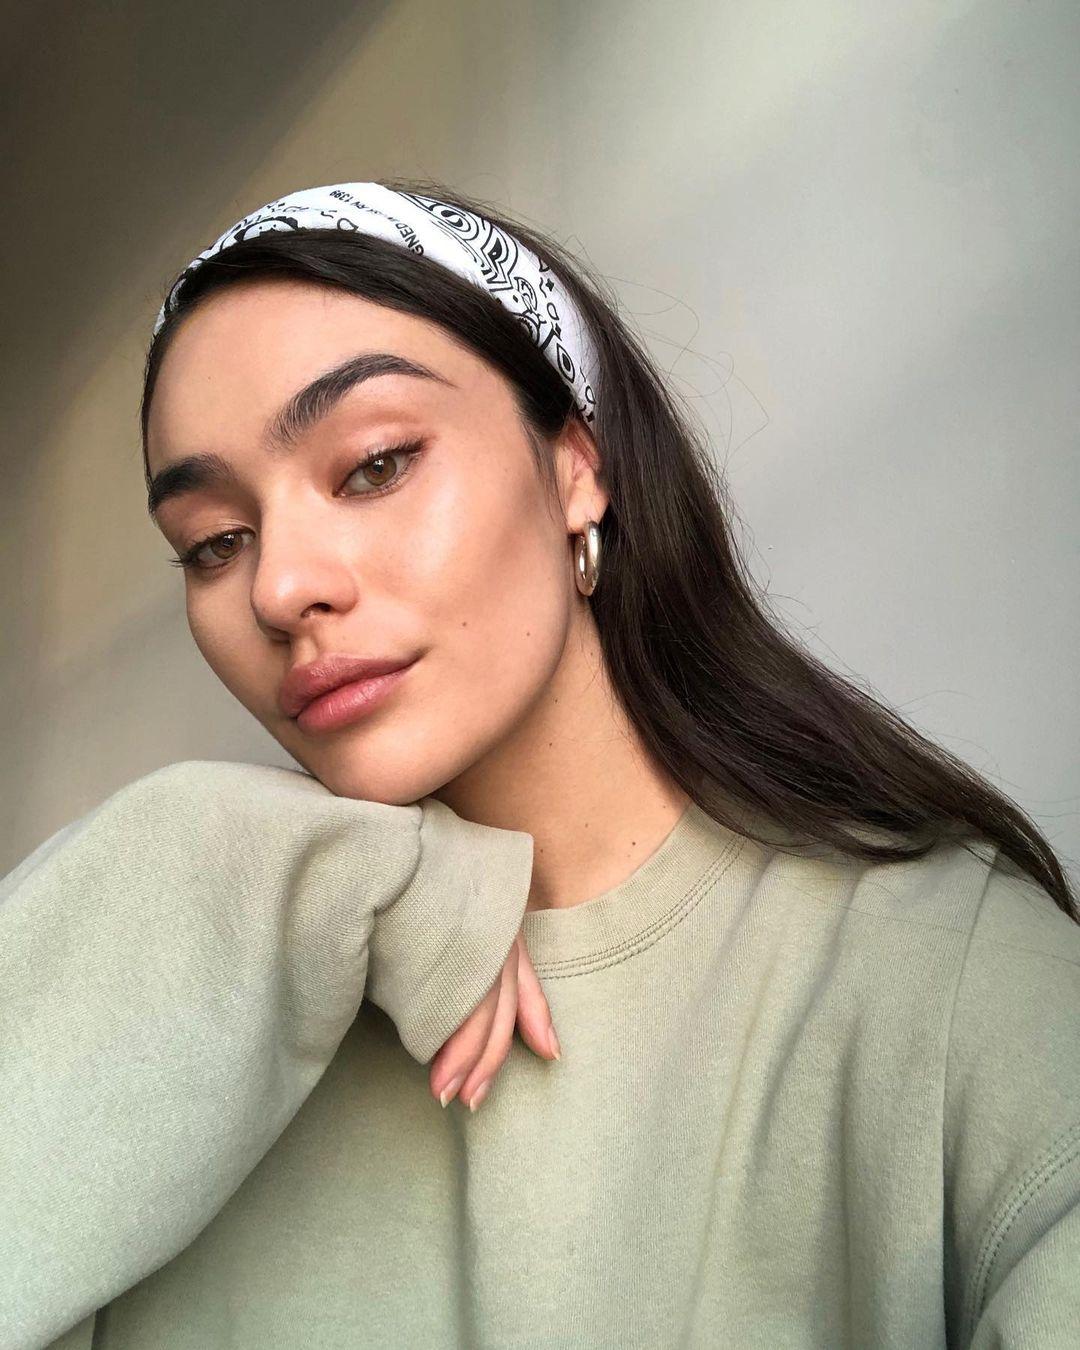 Kaitlyn-Fitzpatrick-Wallpapers-Insta-Fit-Bio-20